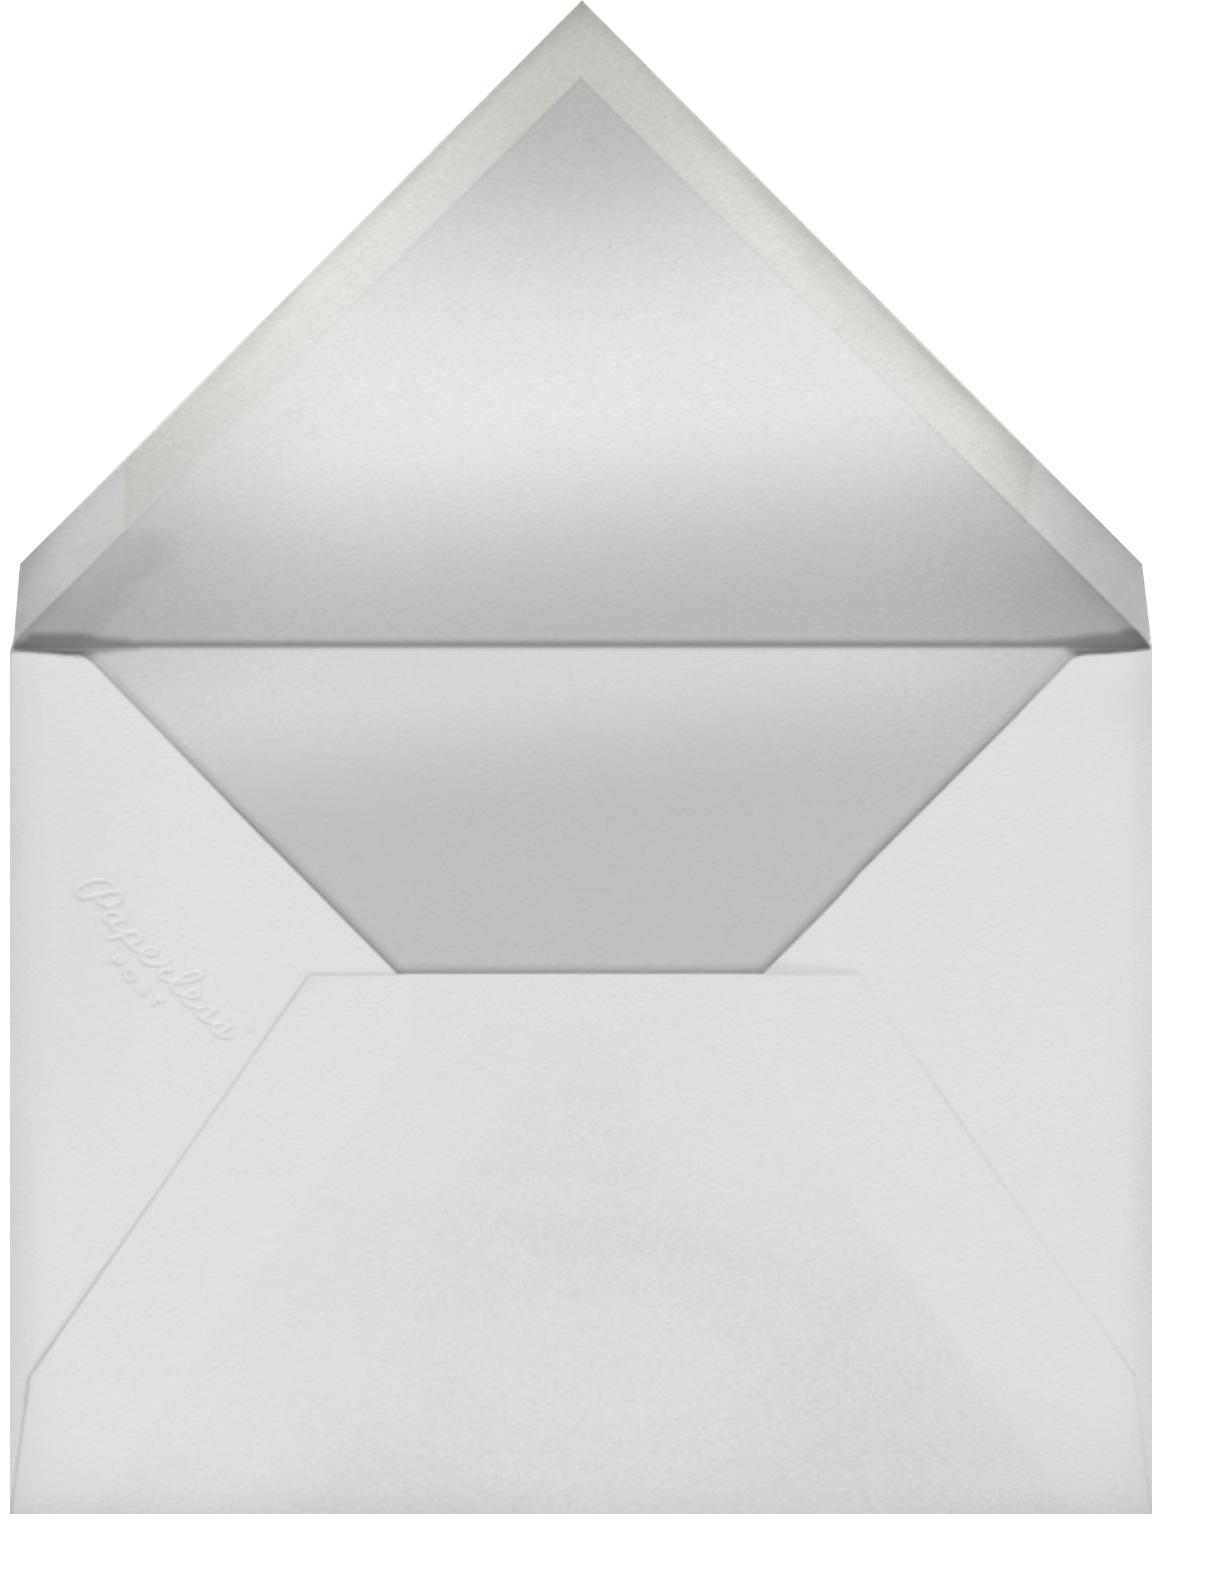 Manhattan Skyline View (Program) - White/Black - Paperless Post - Menus and programs - envelope back